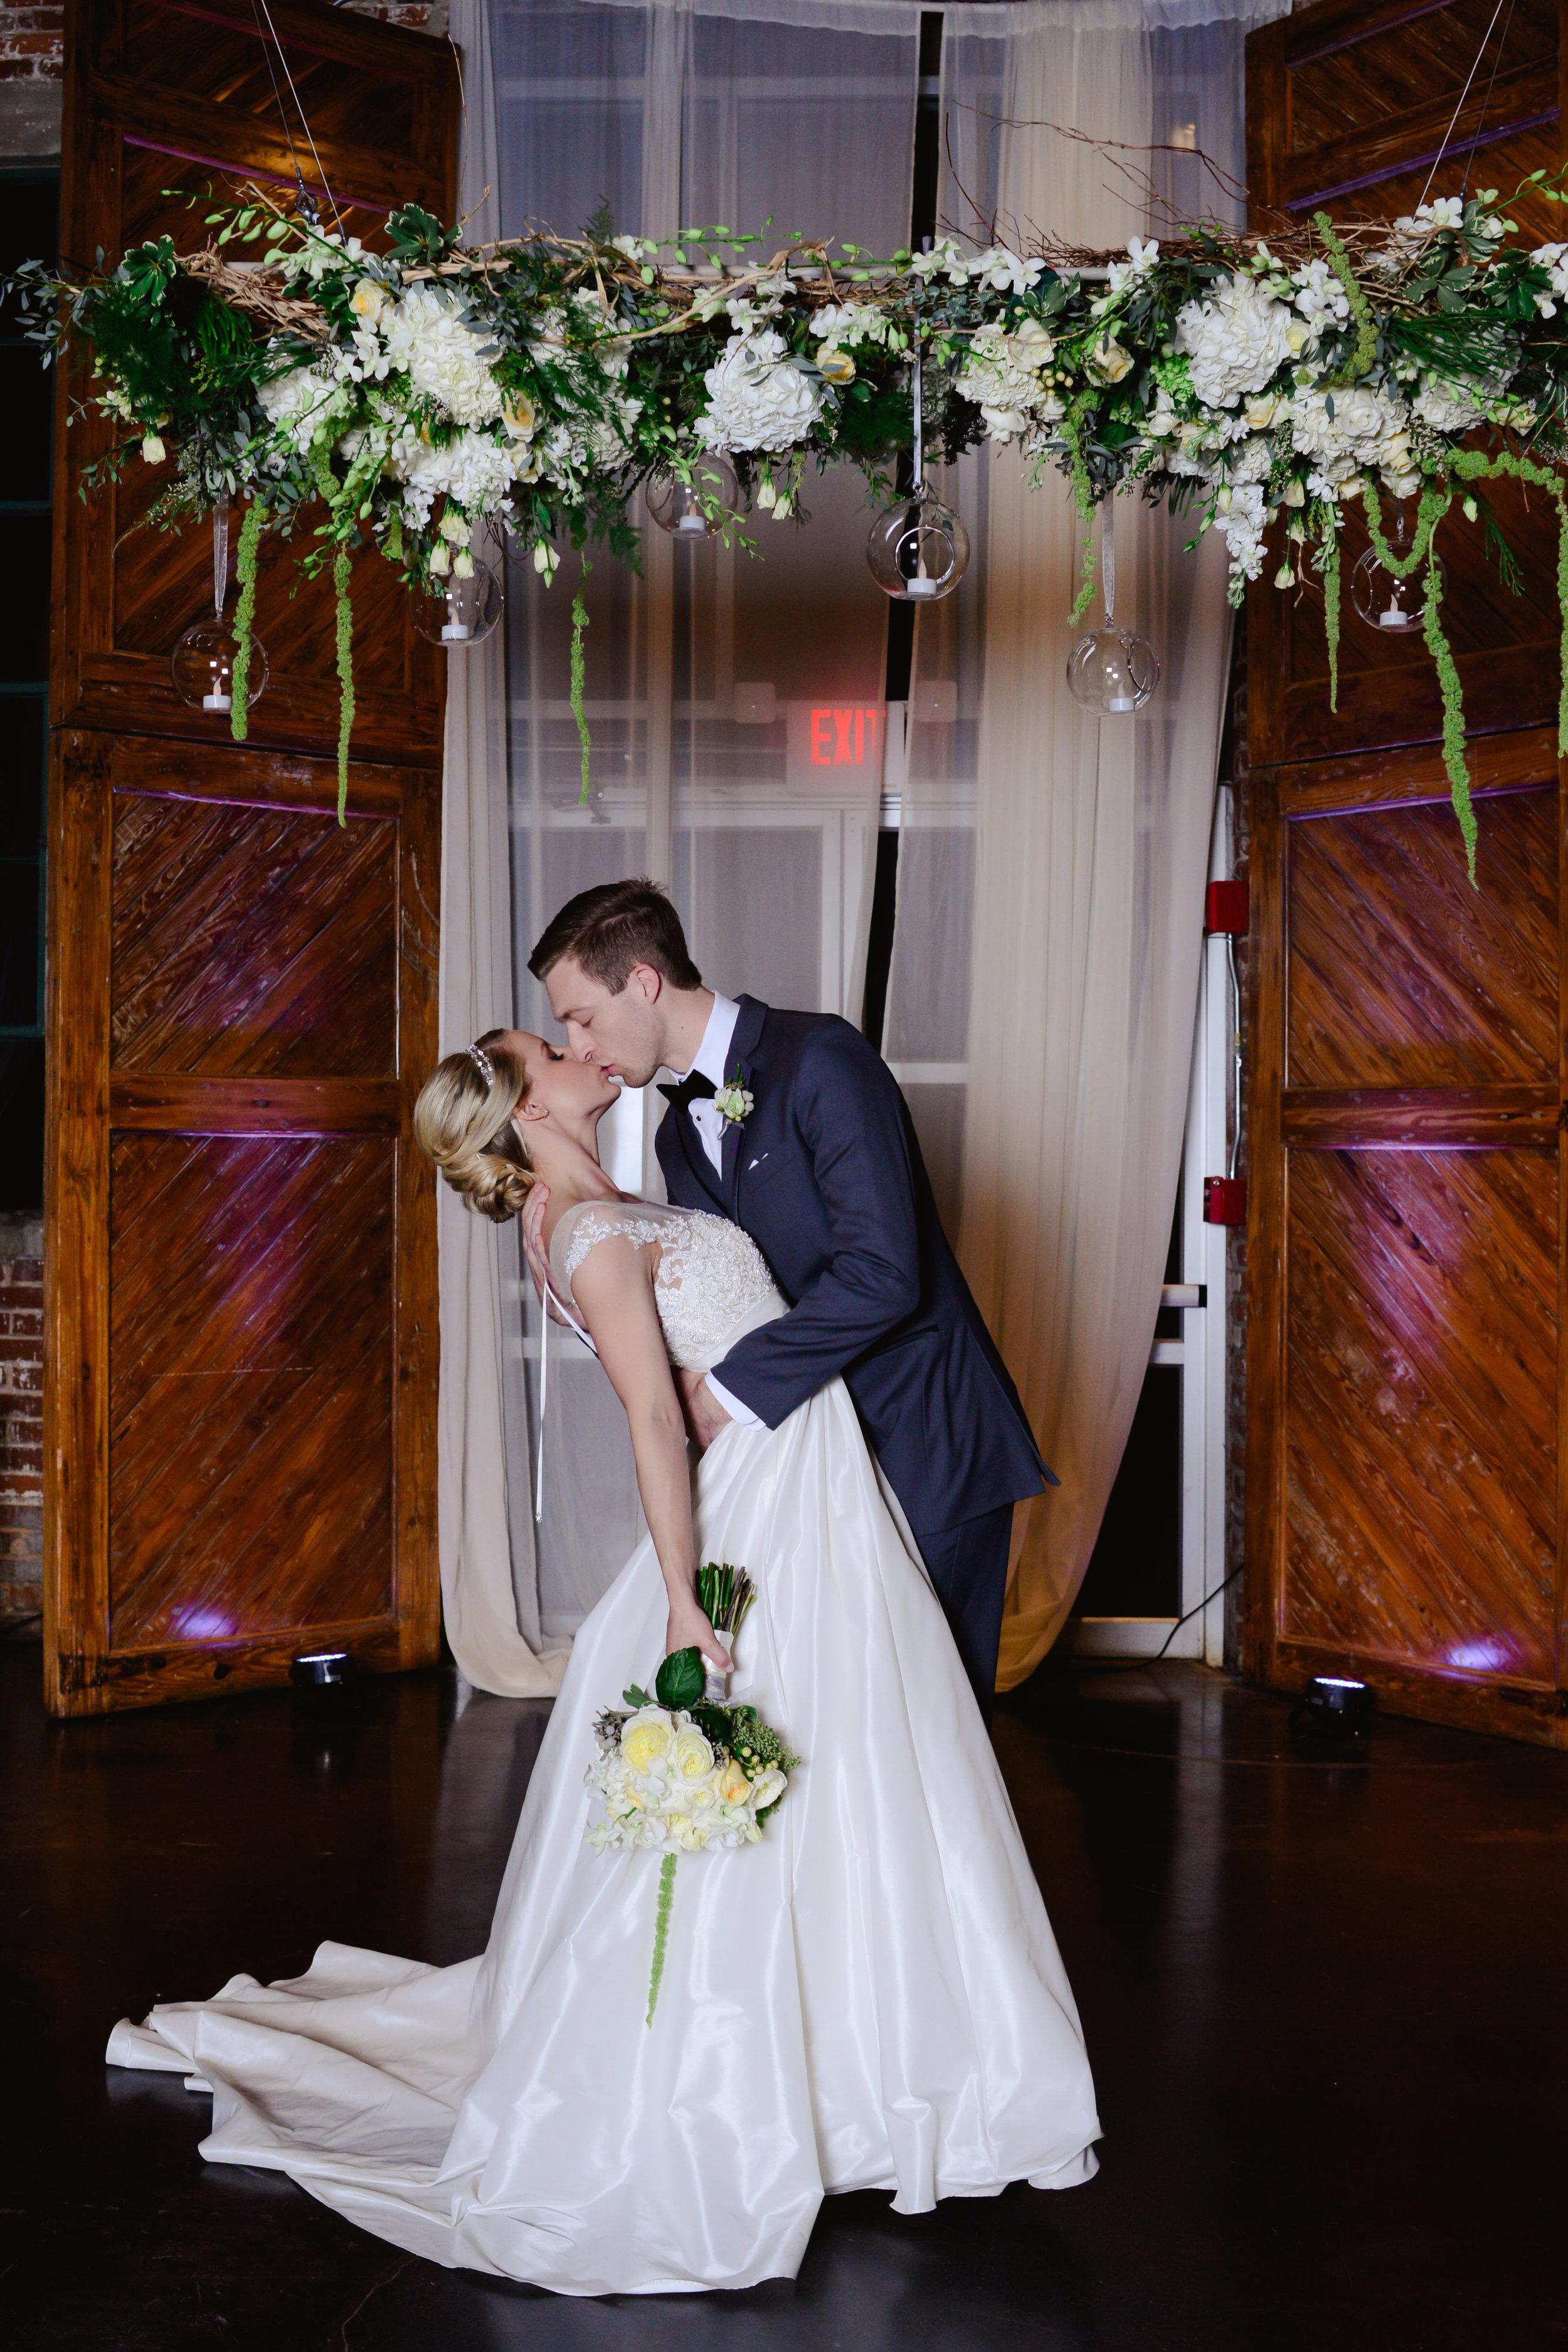 sarah-and-justin-smith-wedding-0464.jpg